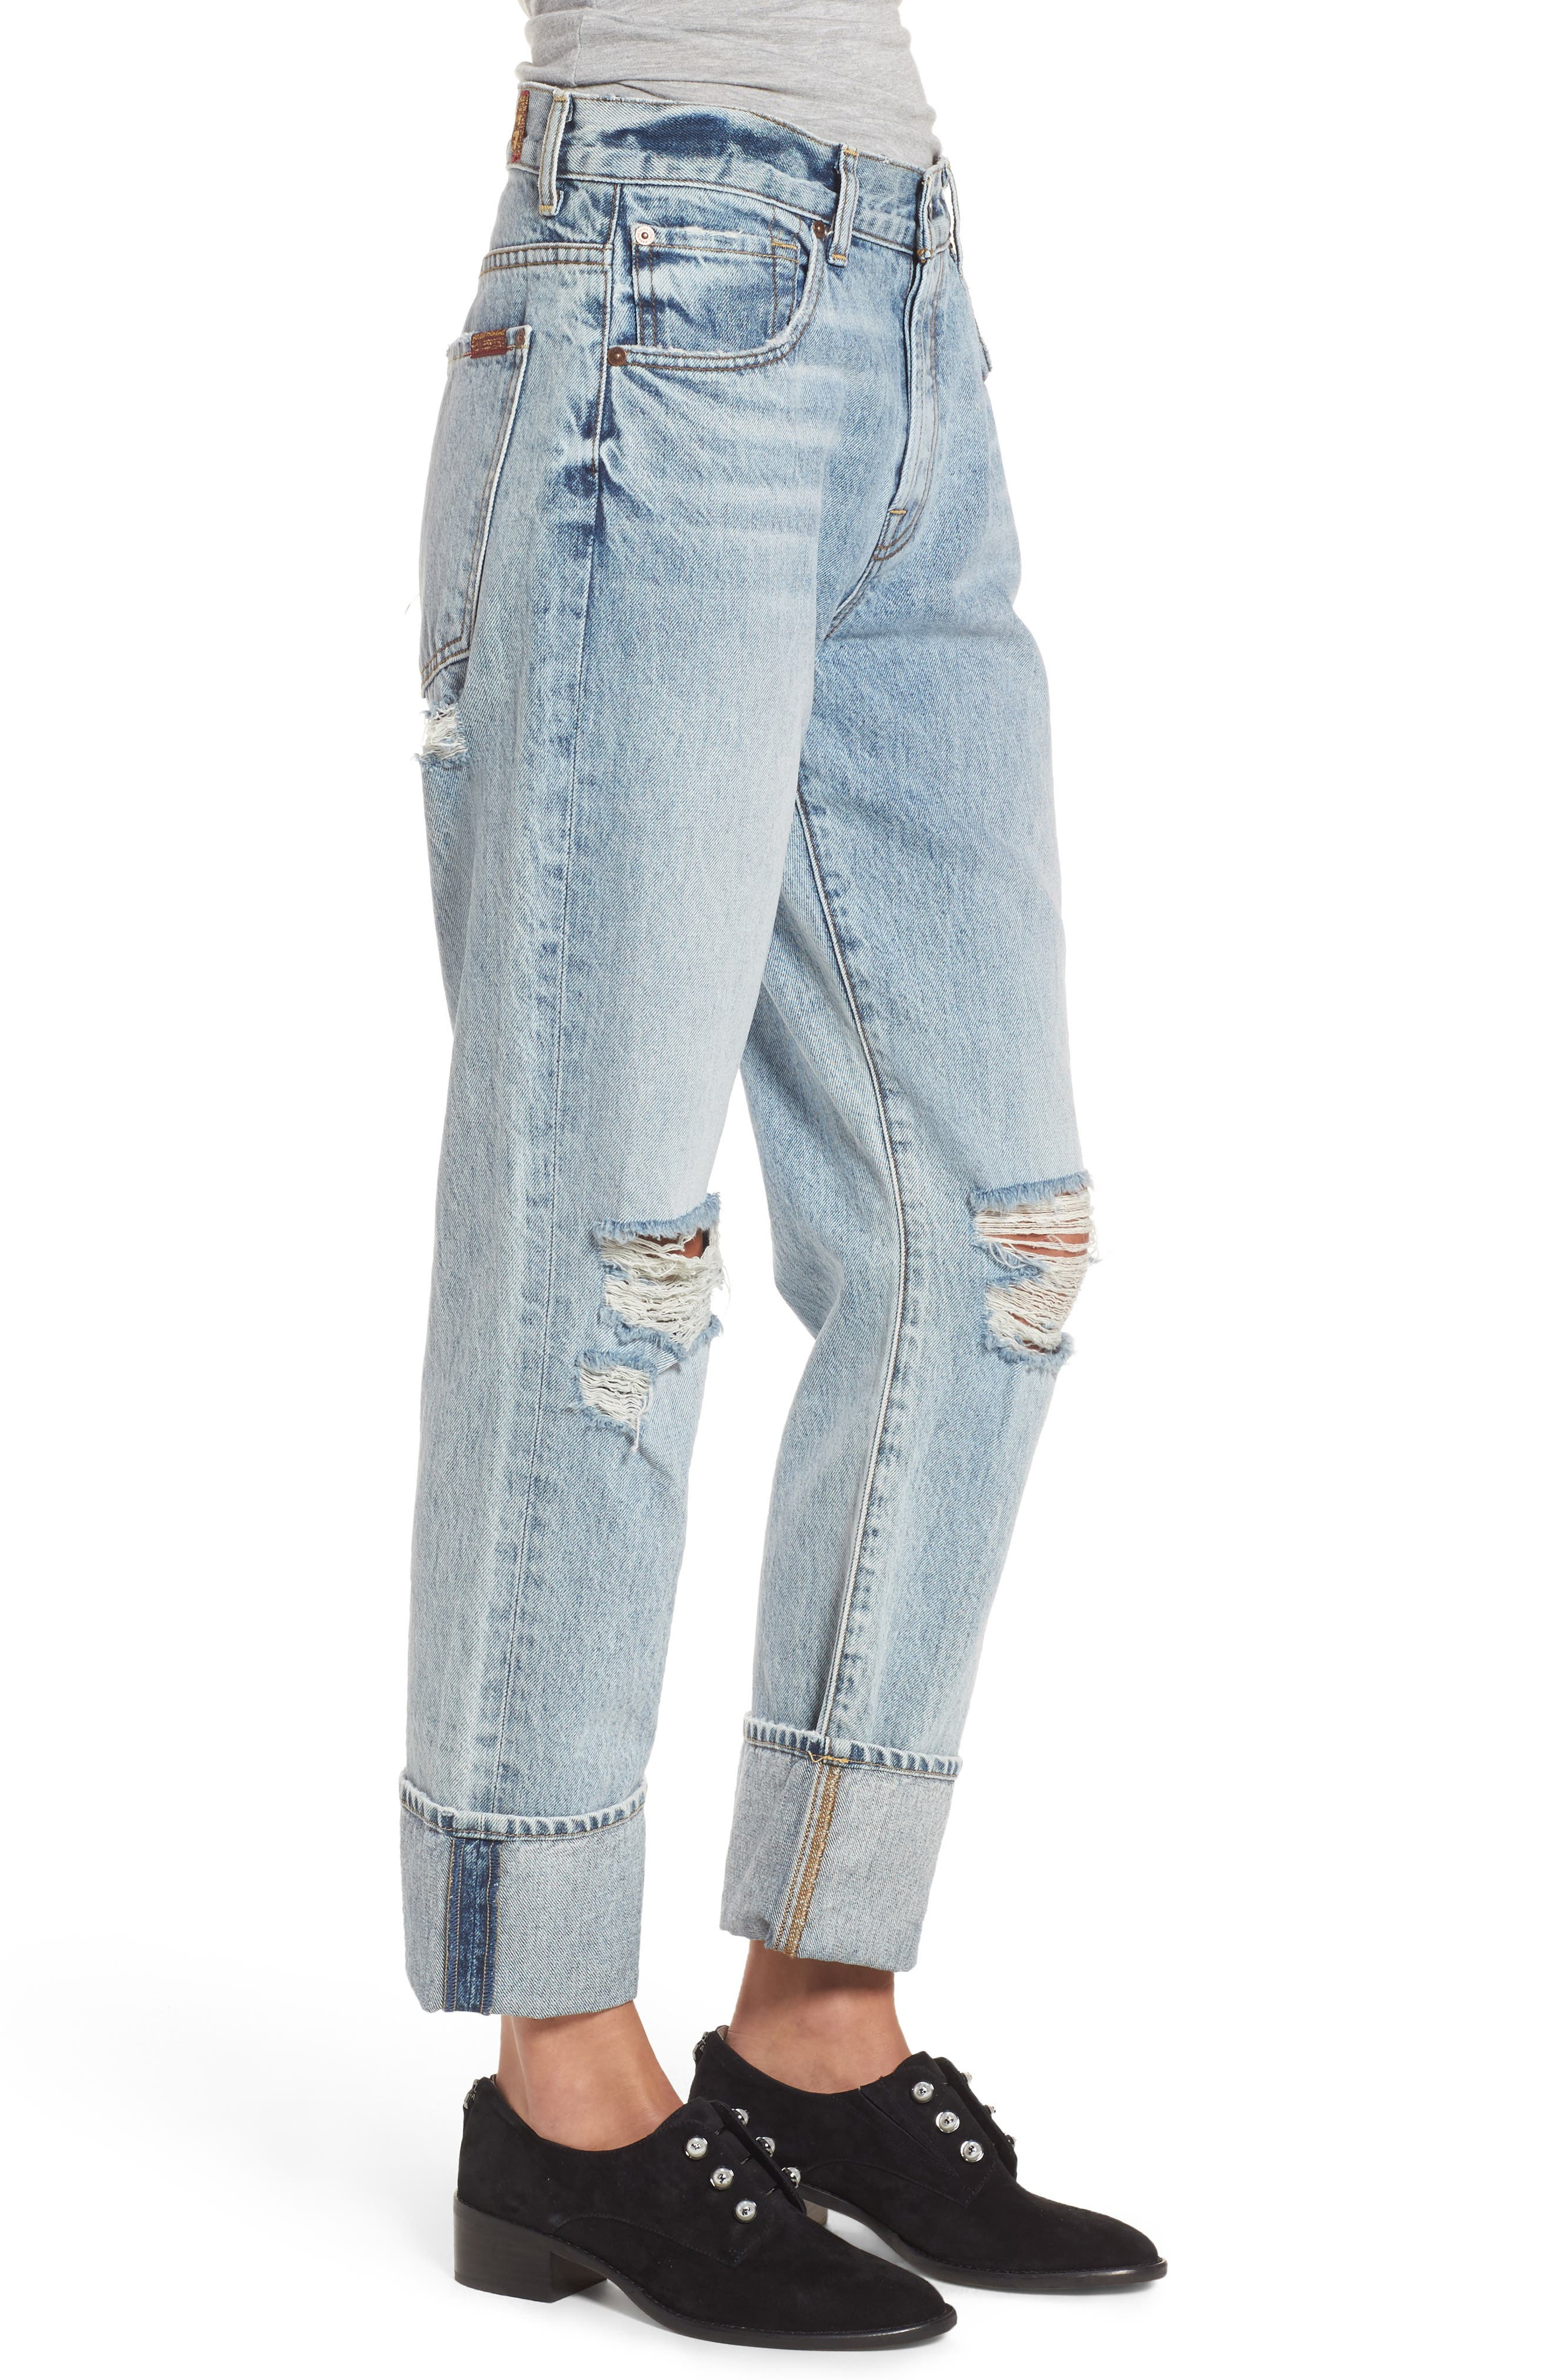 Rickie High Waist Boyfriend Jeans,                             Alternate thumbnail 4, color,                             Mineral Desert Springs 3